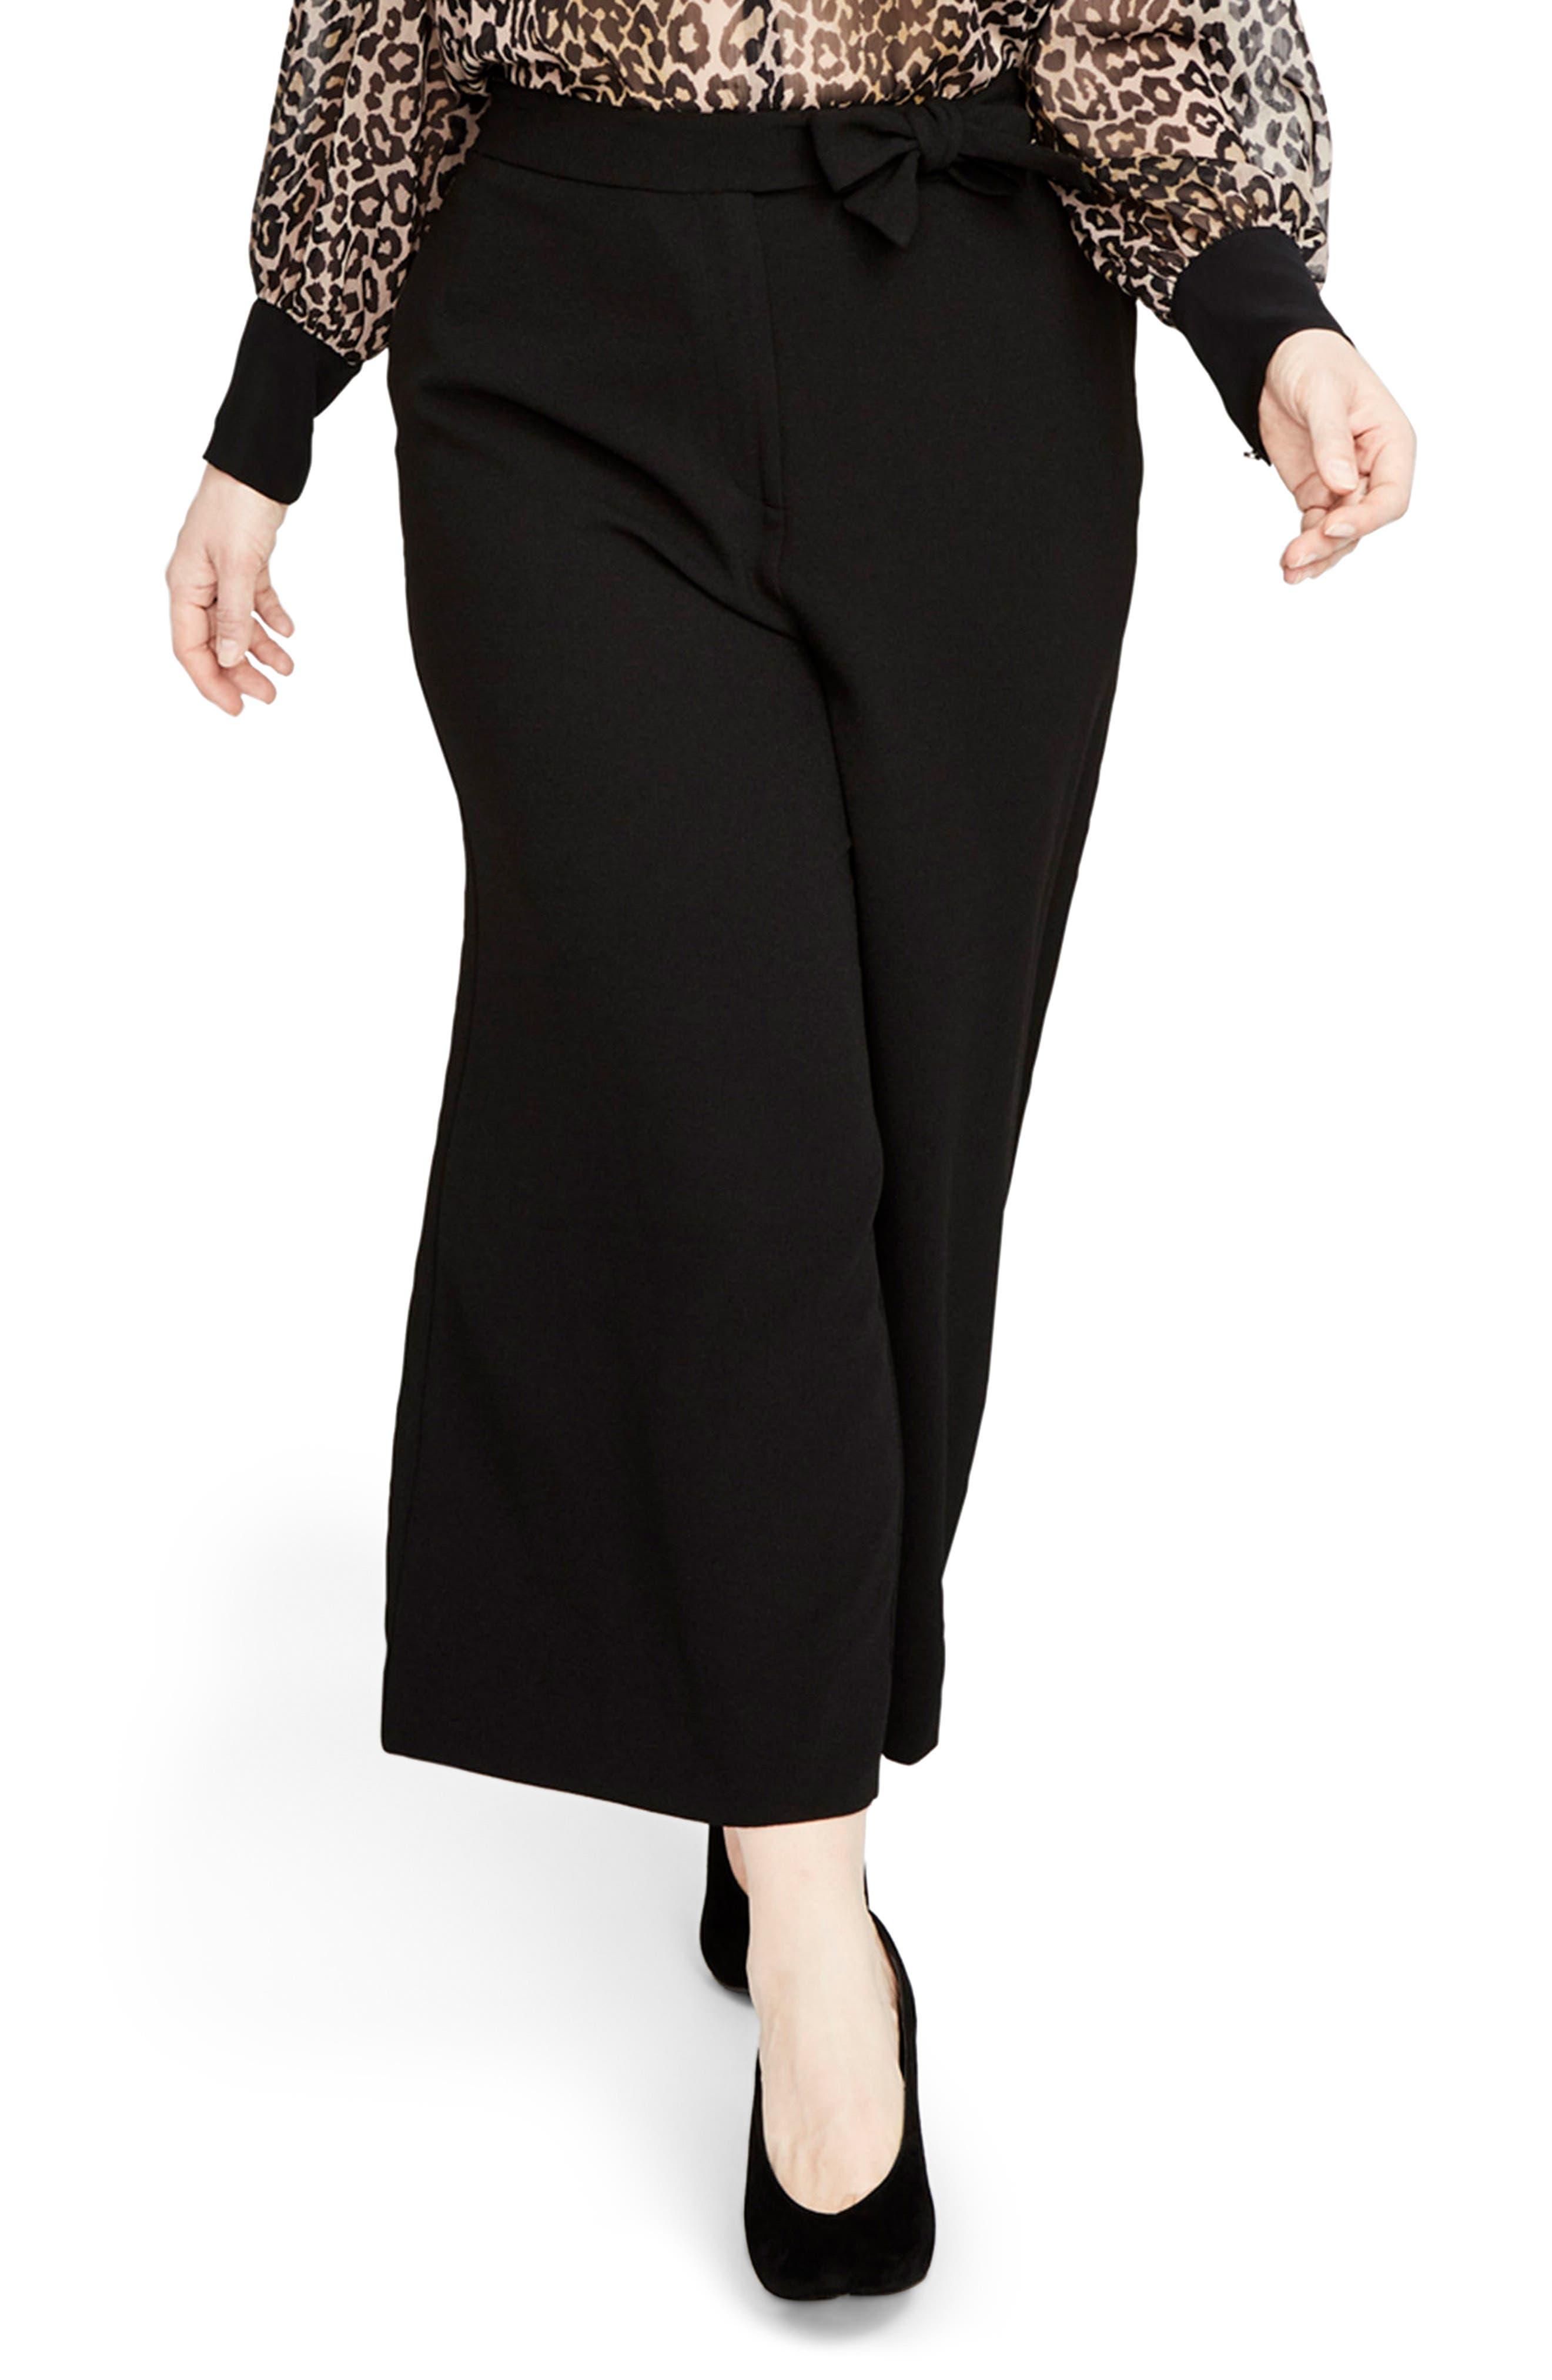 Alternate Image 1 Selected - RACHEL Rachel Roy Cuffed Flare Pants (Plus Size)